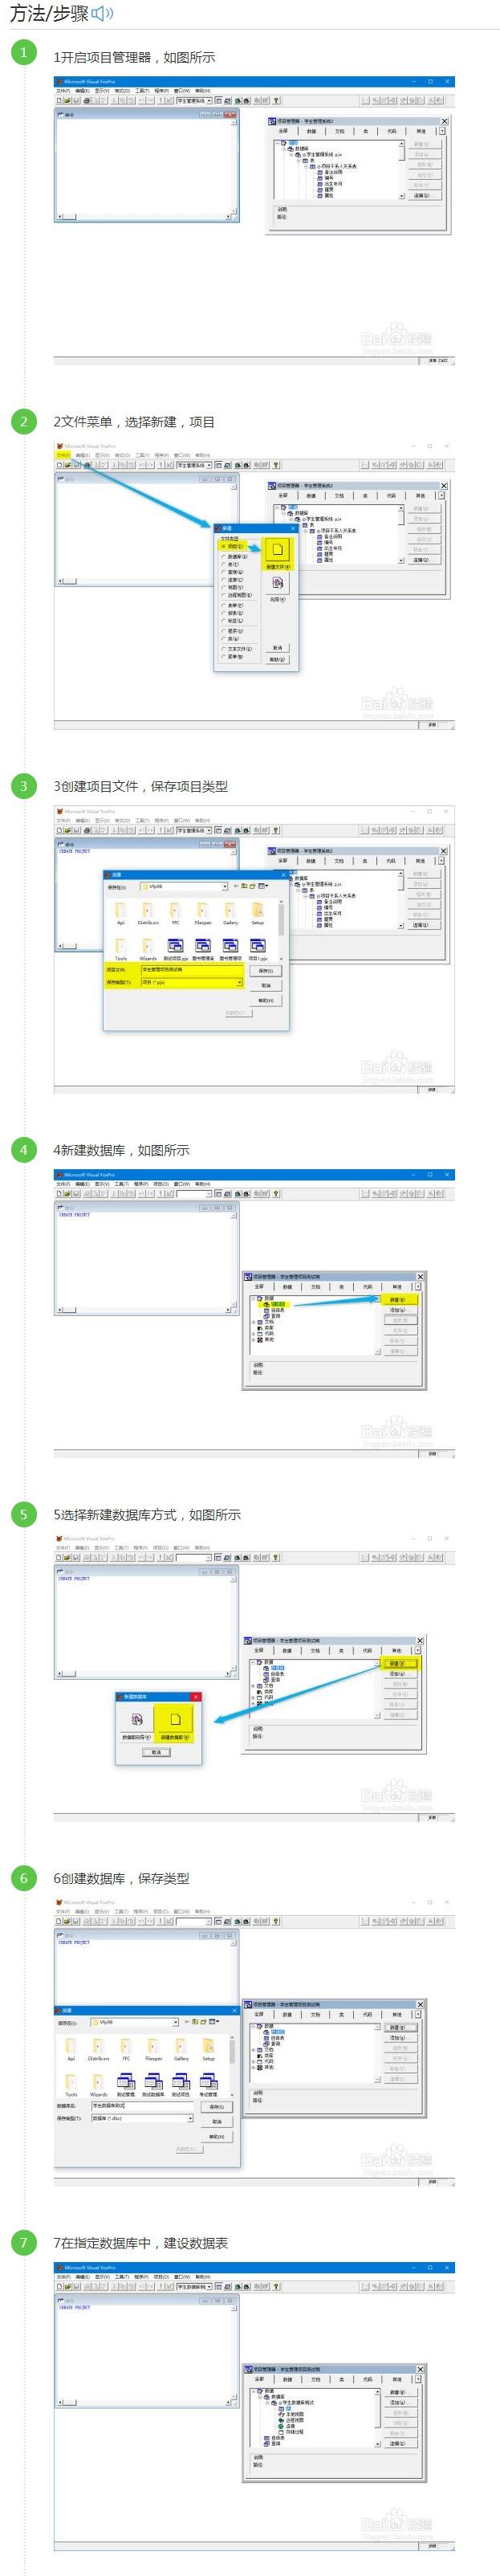 VF設計數據庫經驗分享